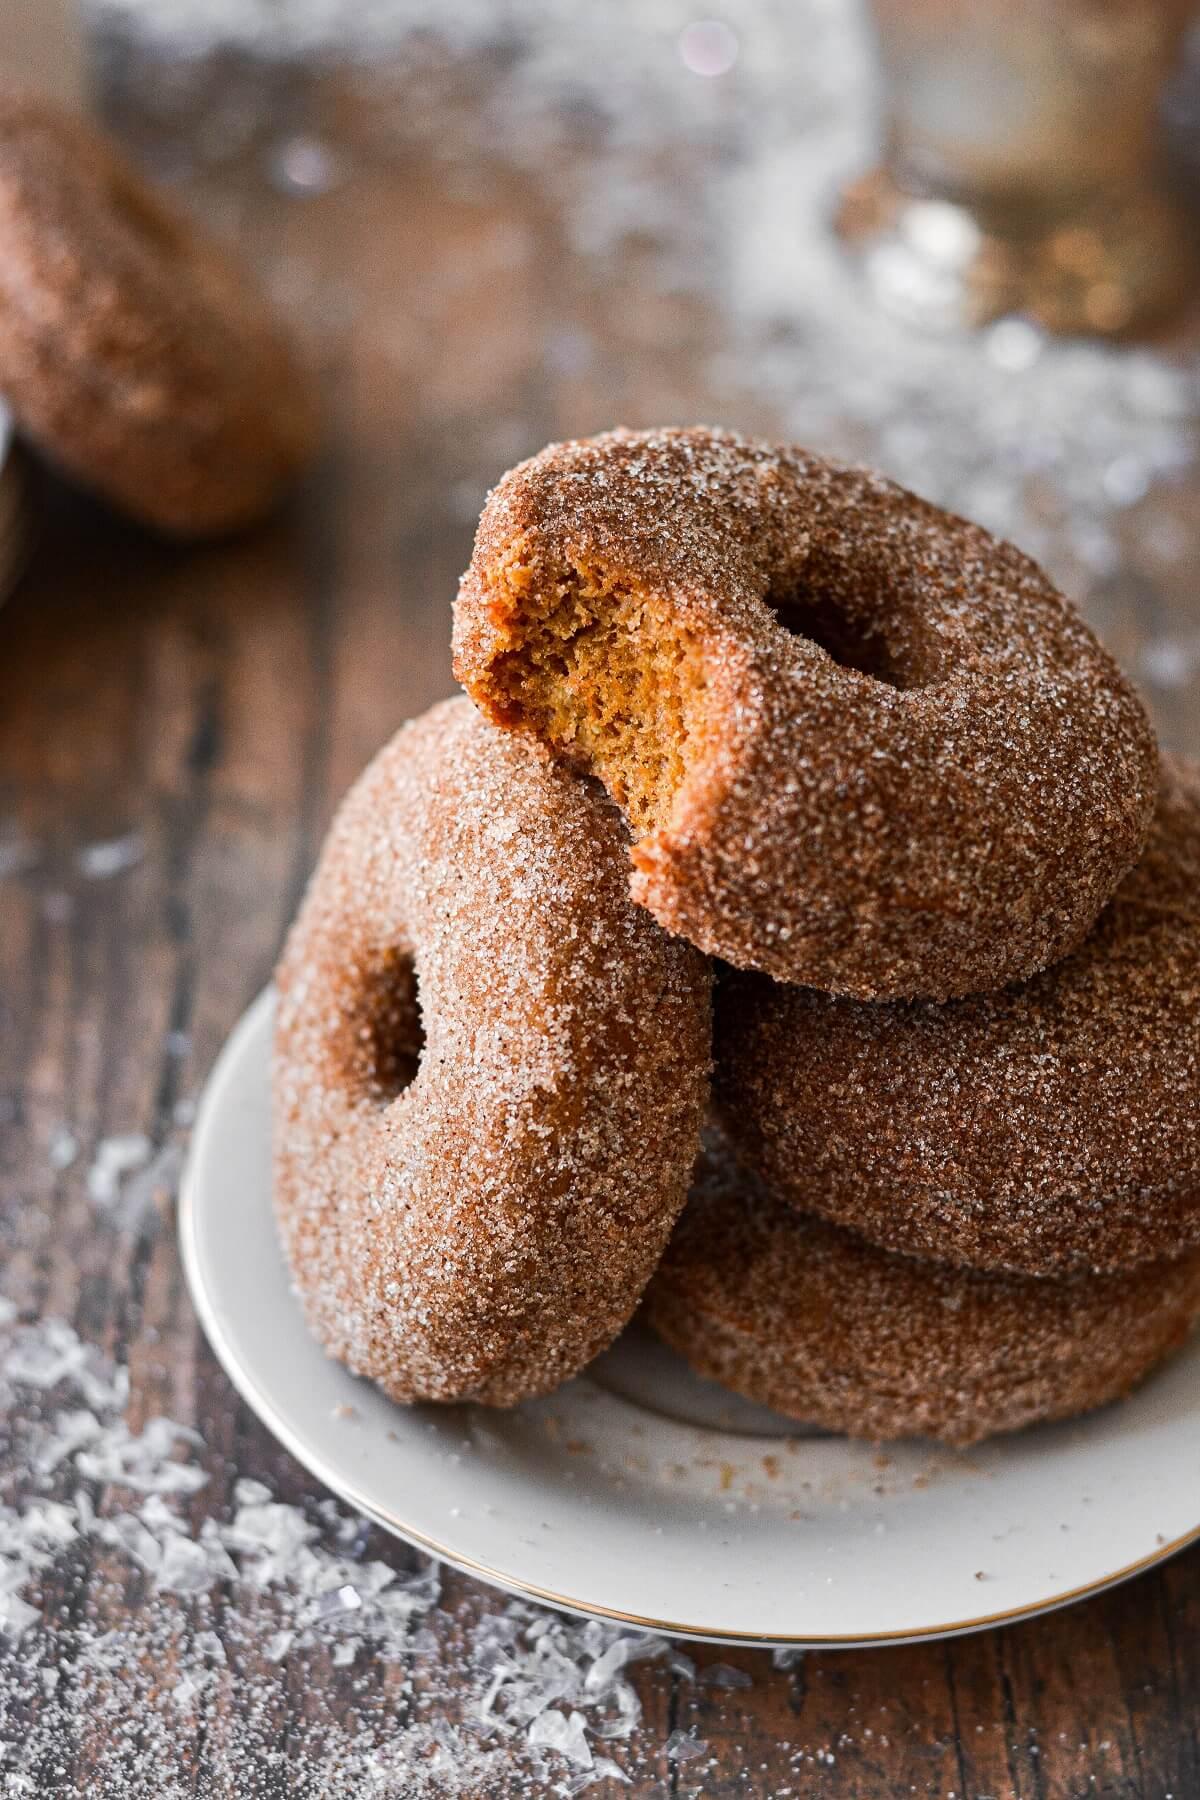 Gingerbread Donuts with Cinnamon Sugar